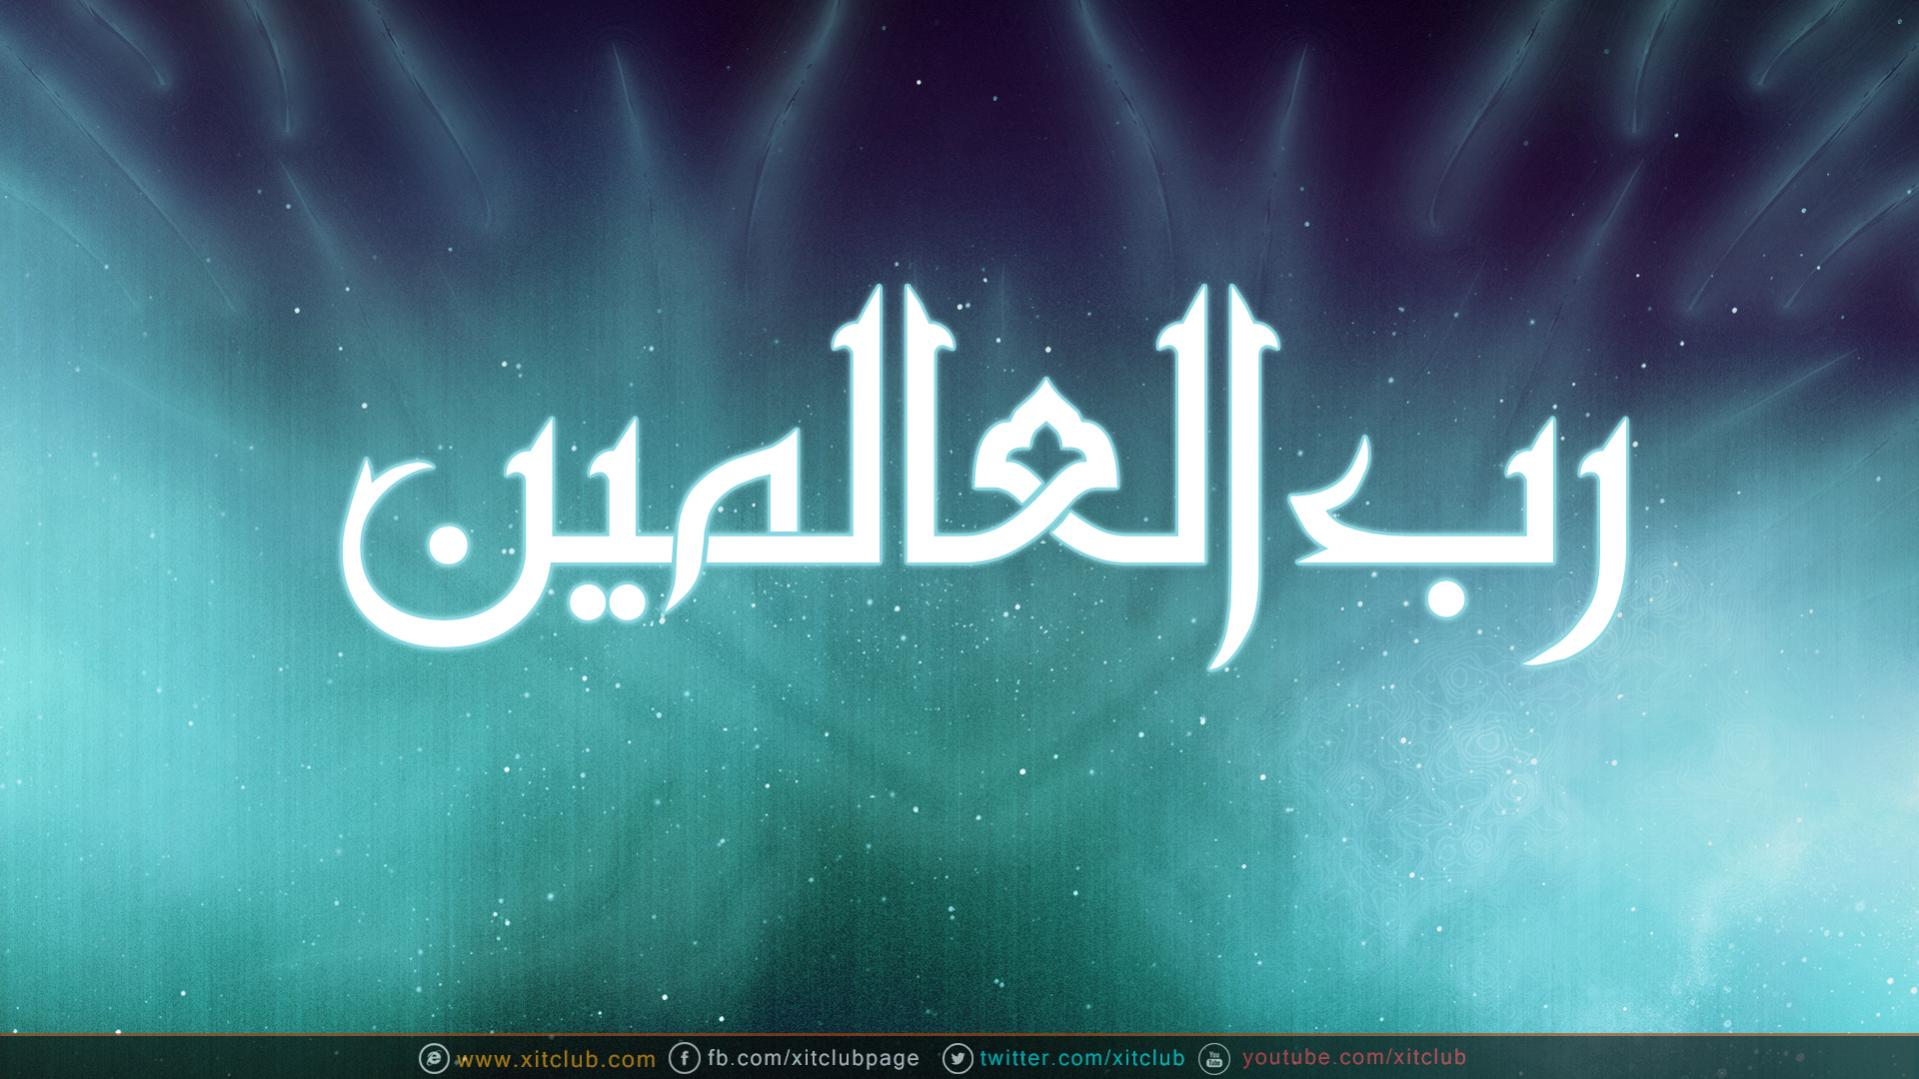 islamic hd wallpapers 1080p hd quality islamic wallpaper hd 3jpg 1919x1079